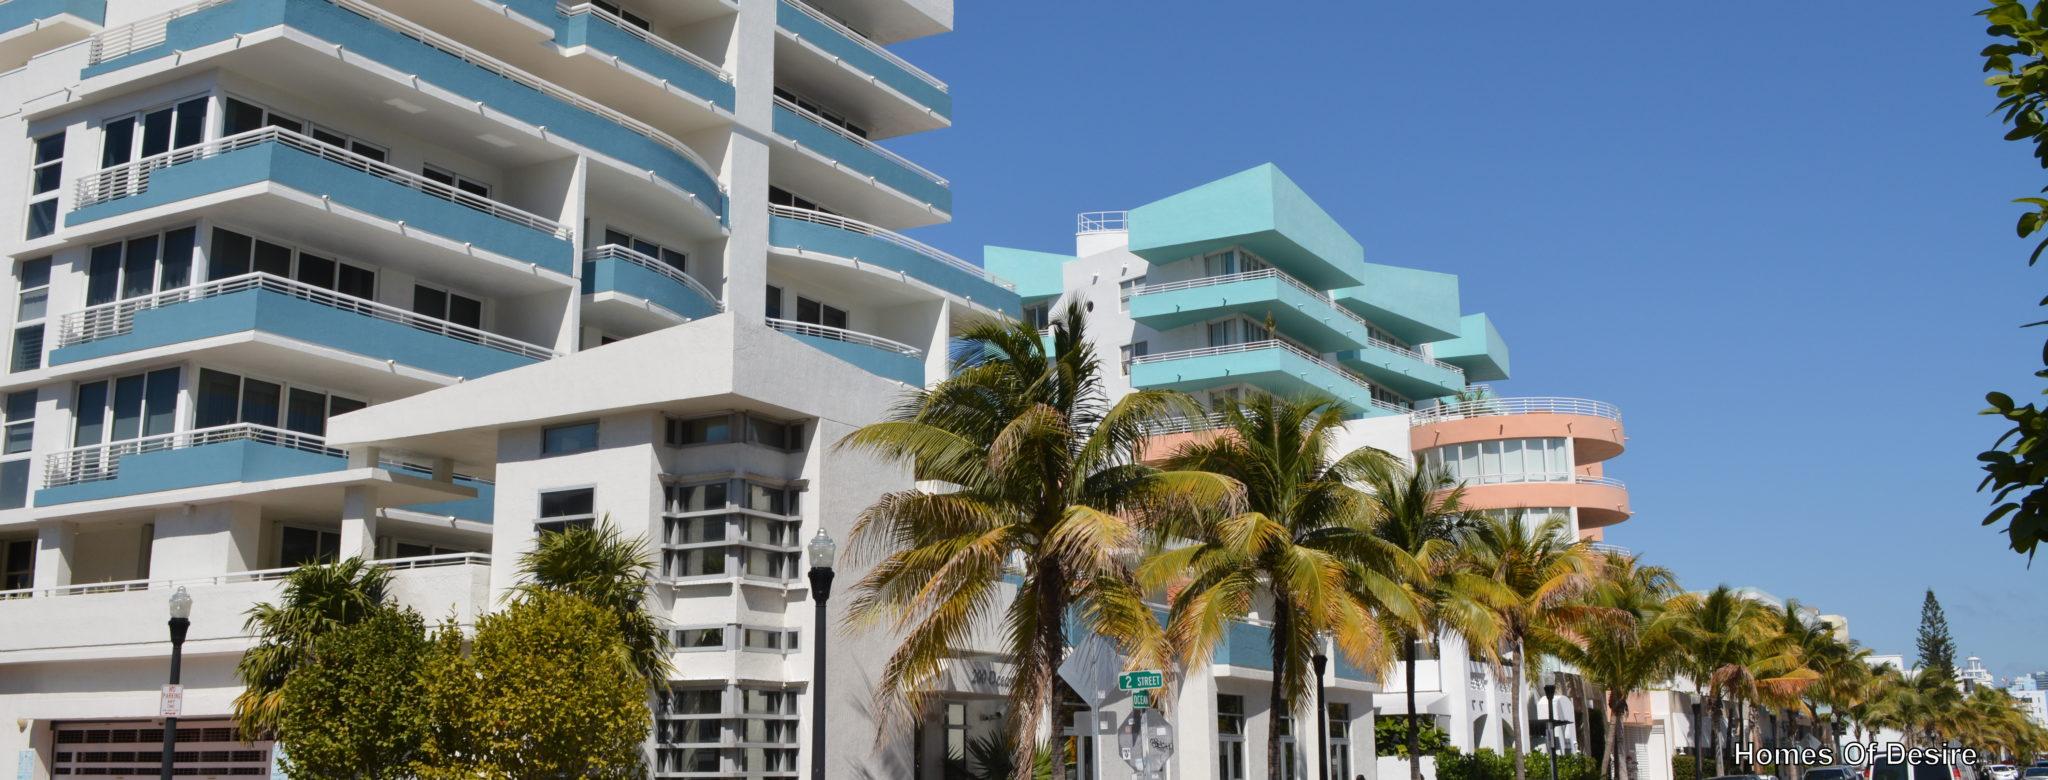 Miami-Beach-slider